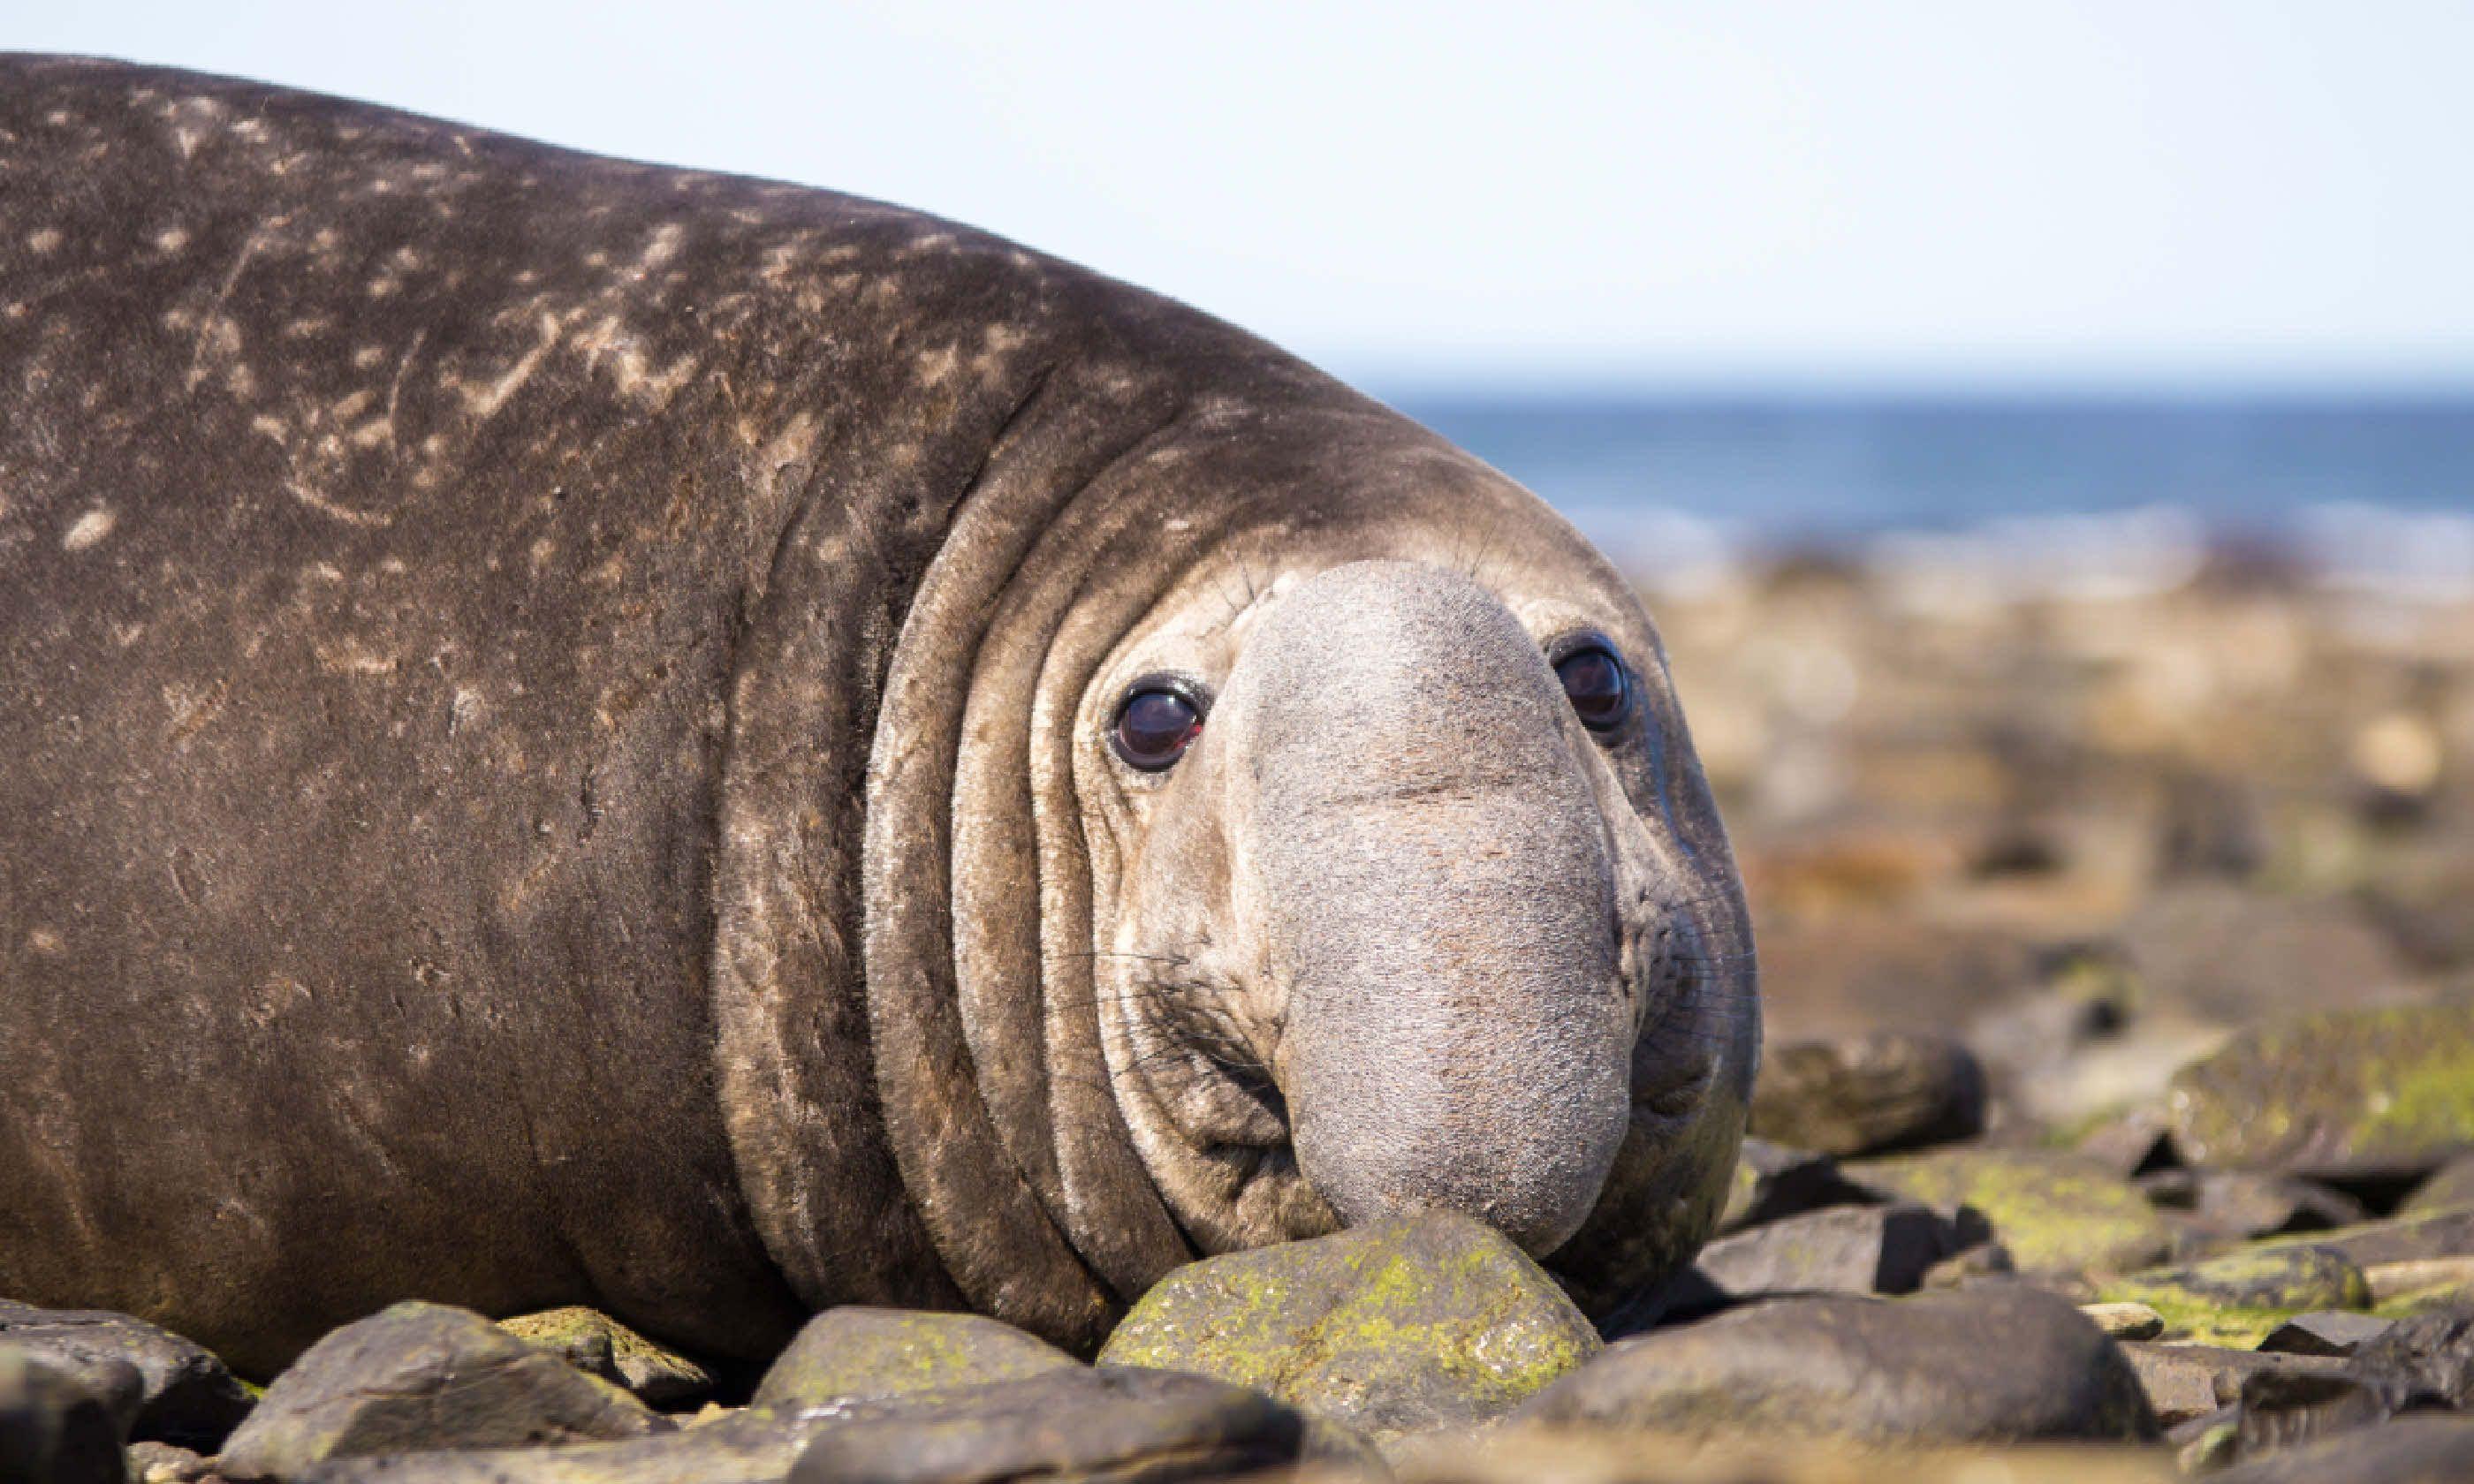 Southern elephant seal (Shutterstock)